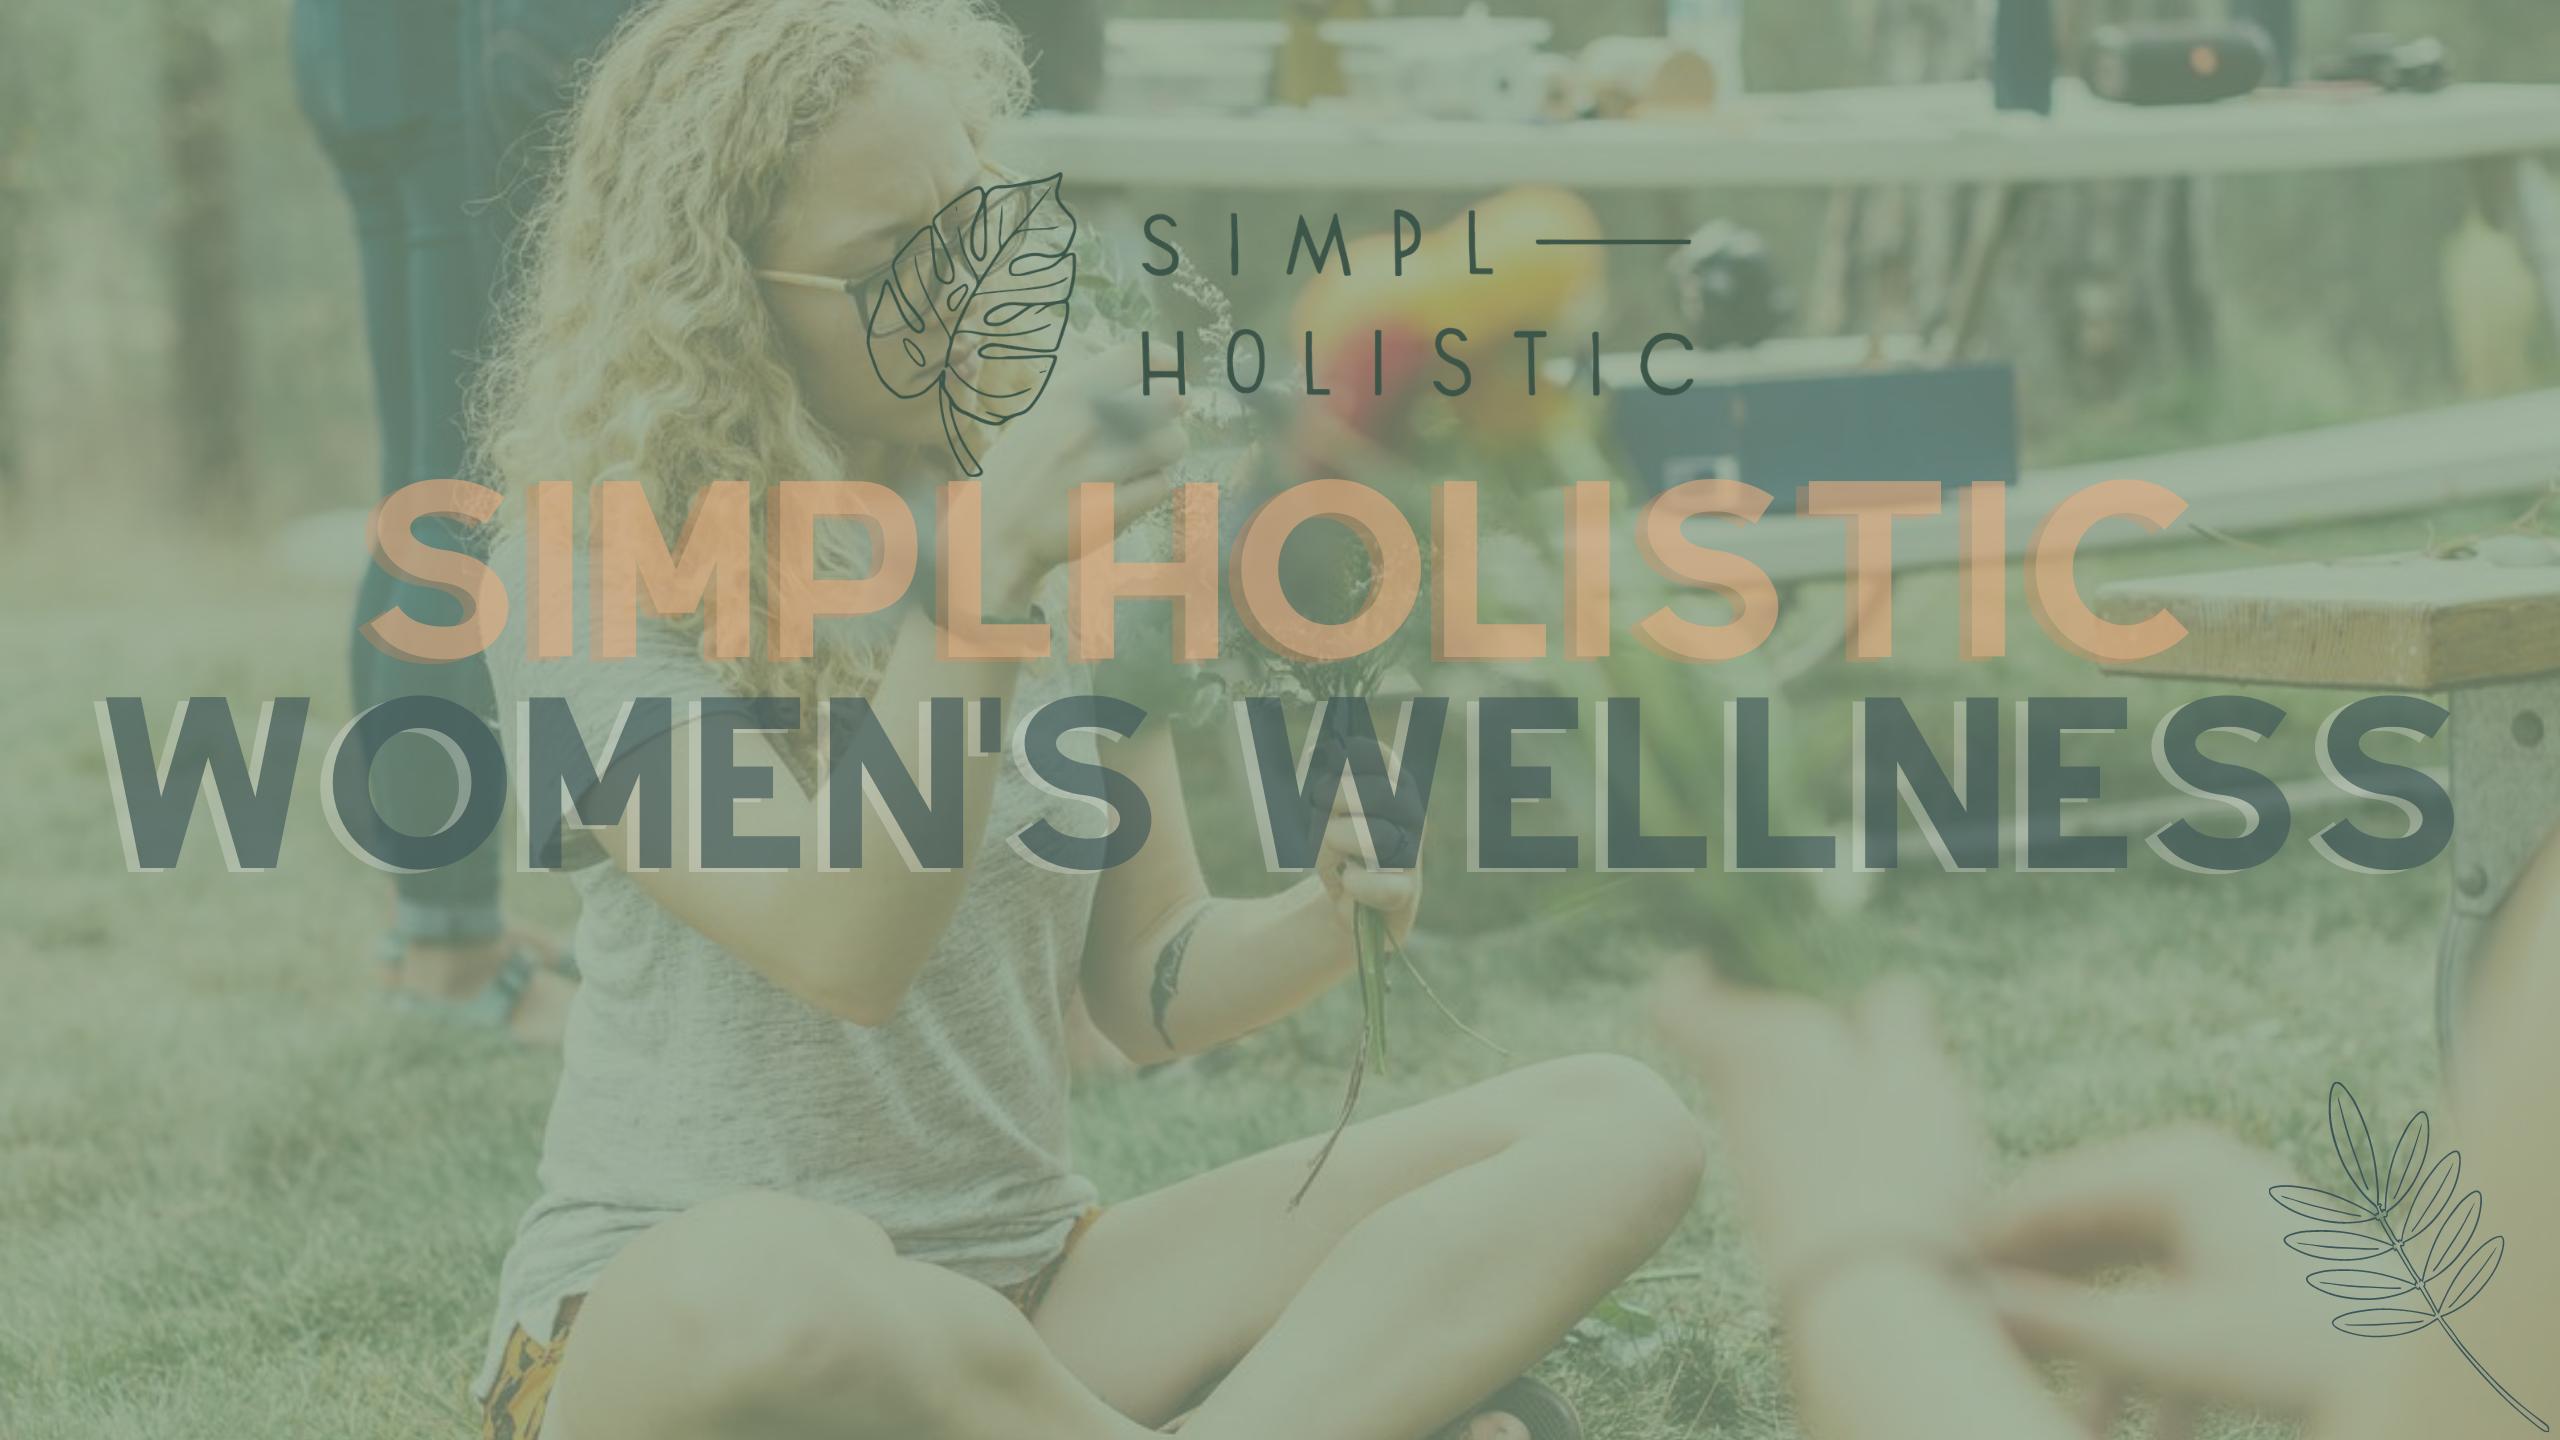 Simplholistic Women